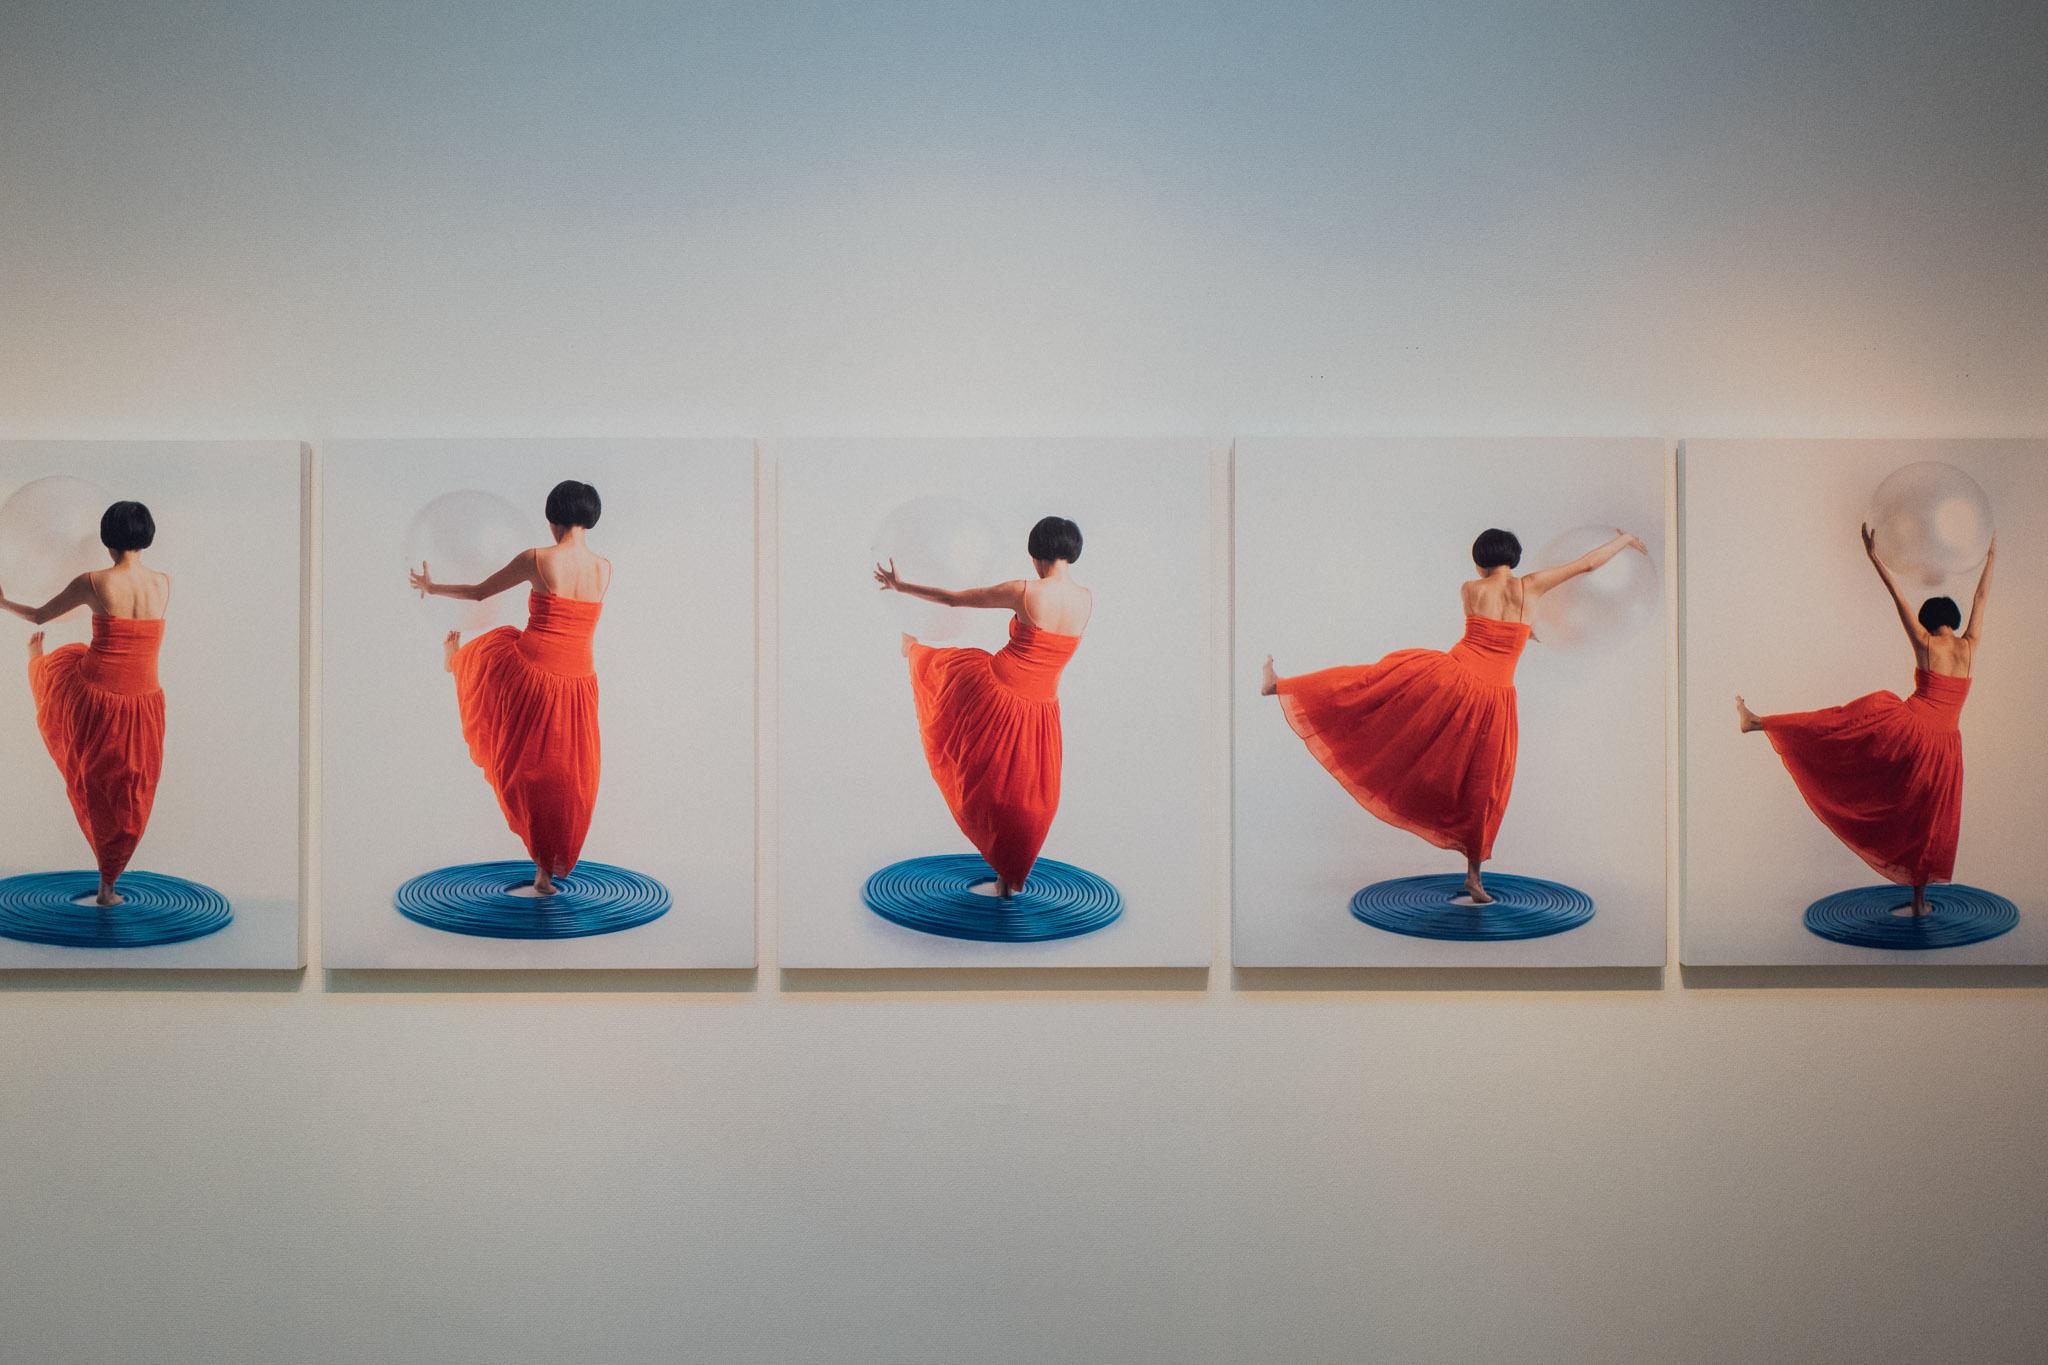 leica-q-photographer-asian-art-museum-fukuoka